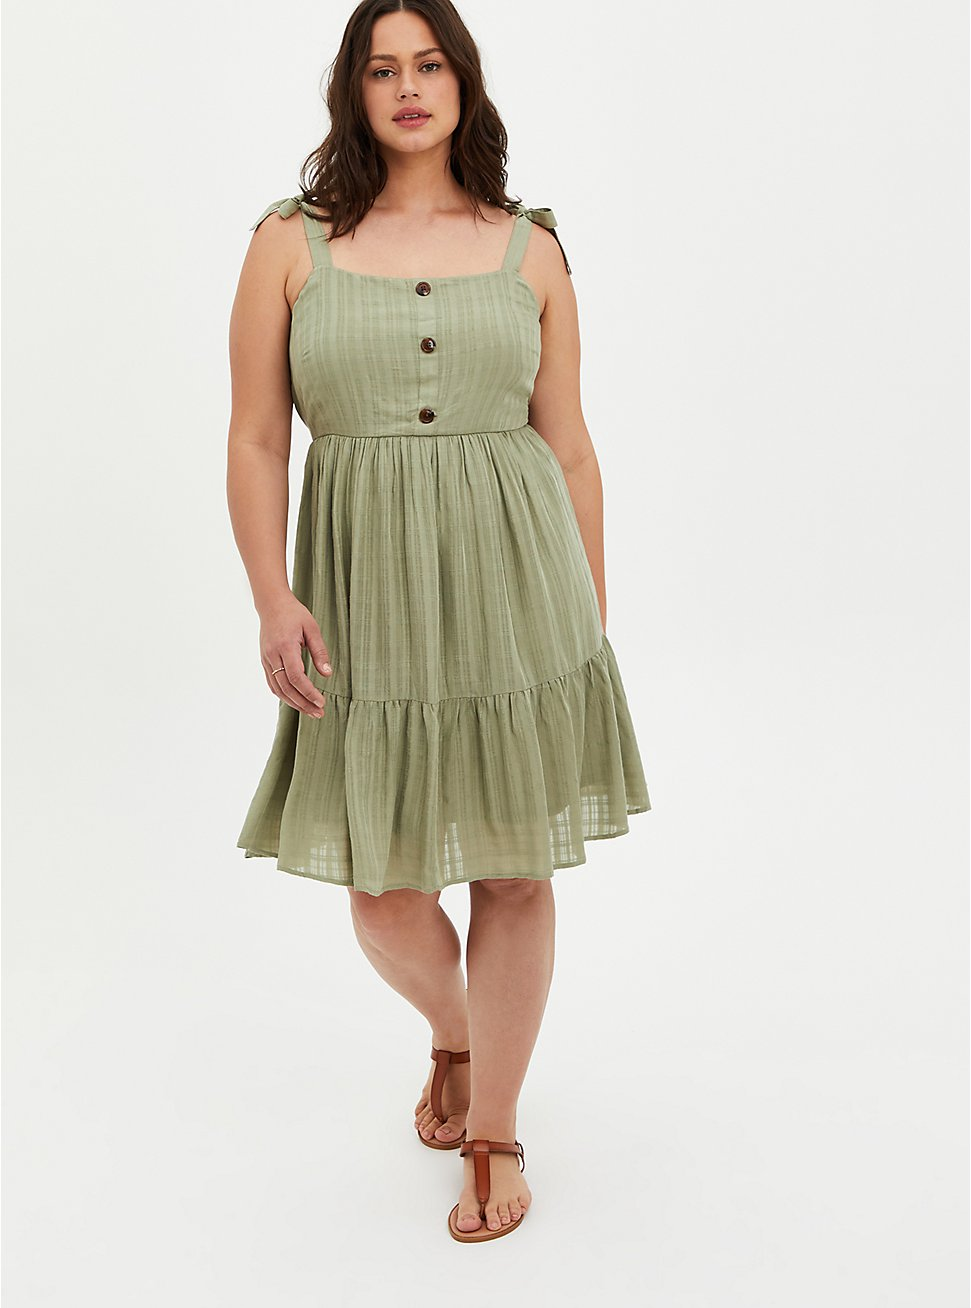 Green Stretch Woven Button Front Pinafore Mini Dress, TEA, hi-res